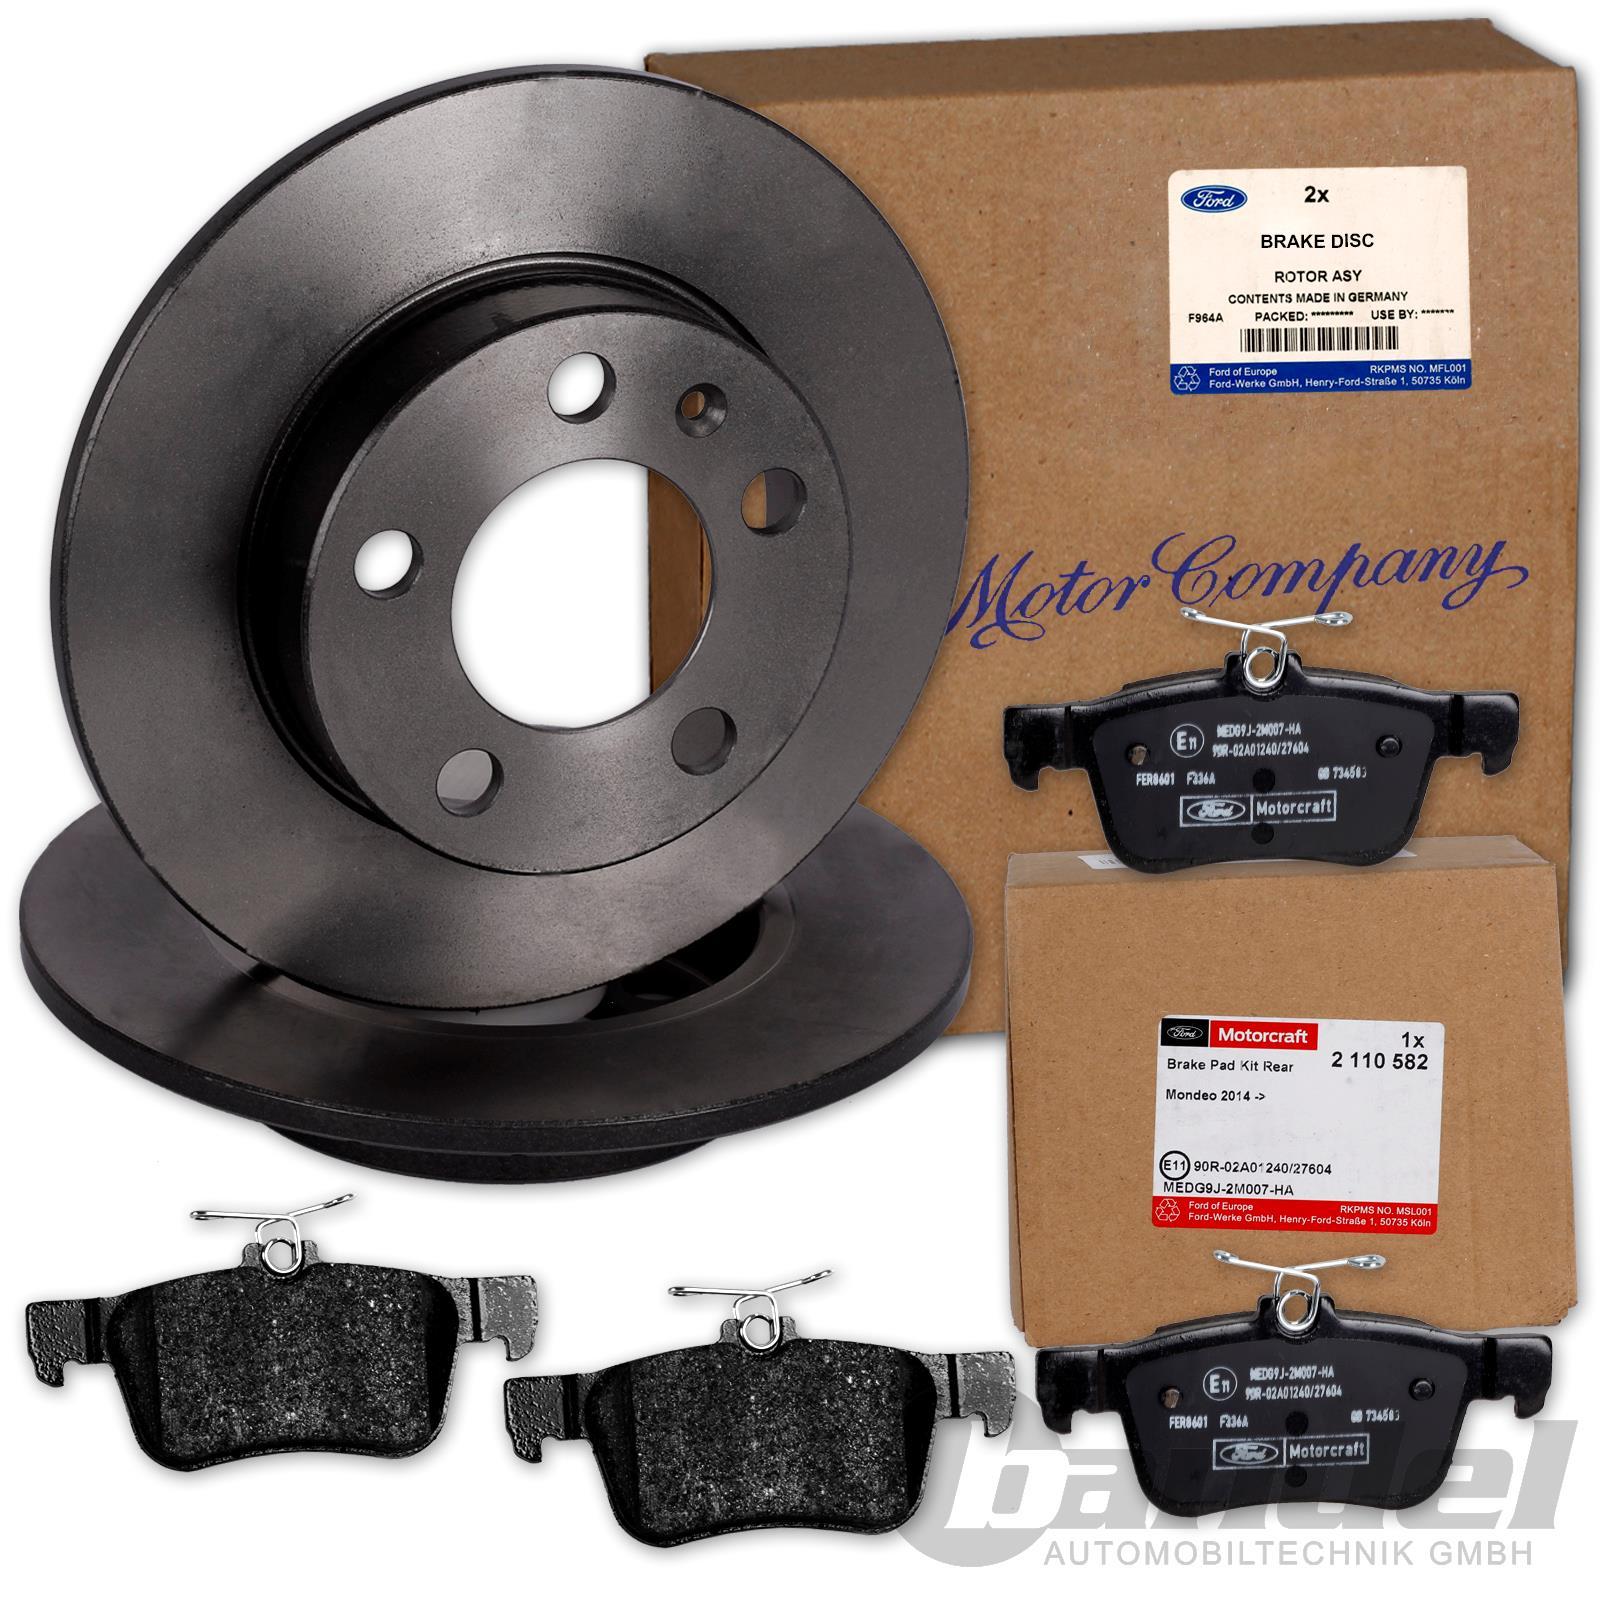 Beläge MONDEO V MK5 16 Zoll vorne ORIGINAL Ford Bremsen Kit Bremsscheiben